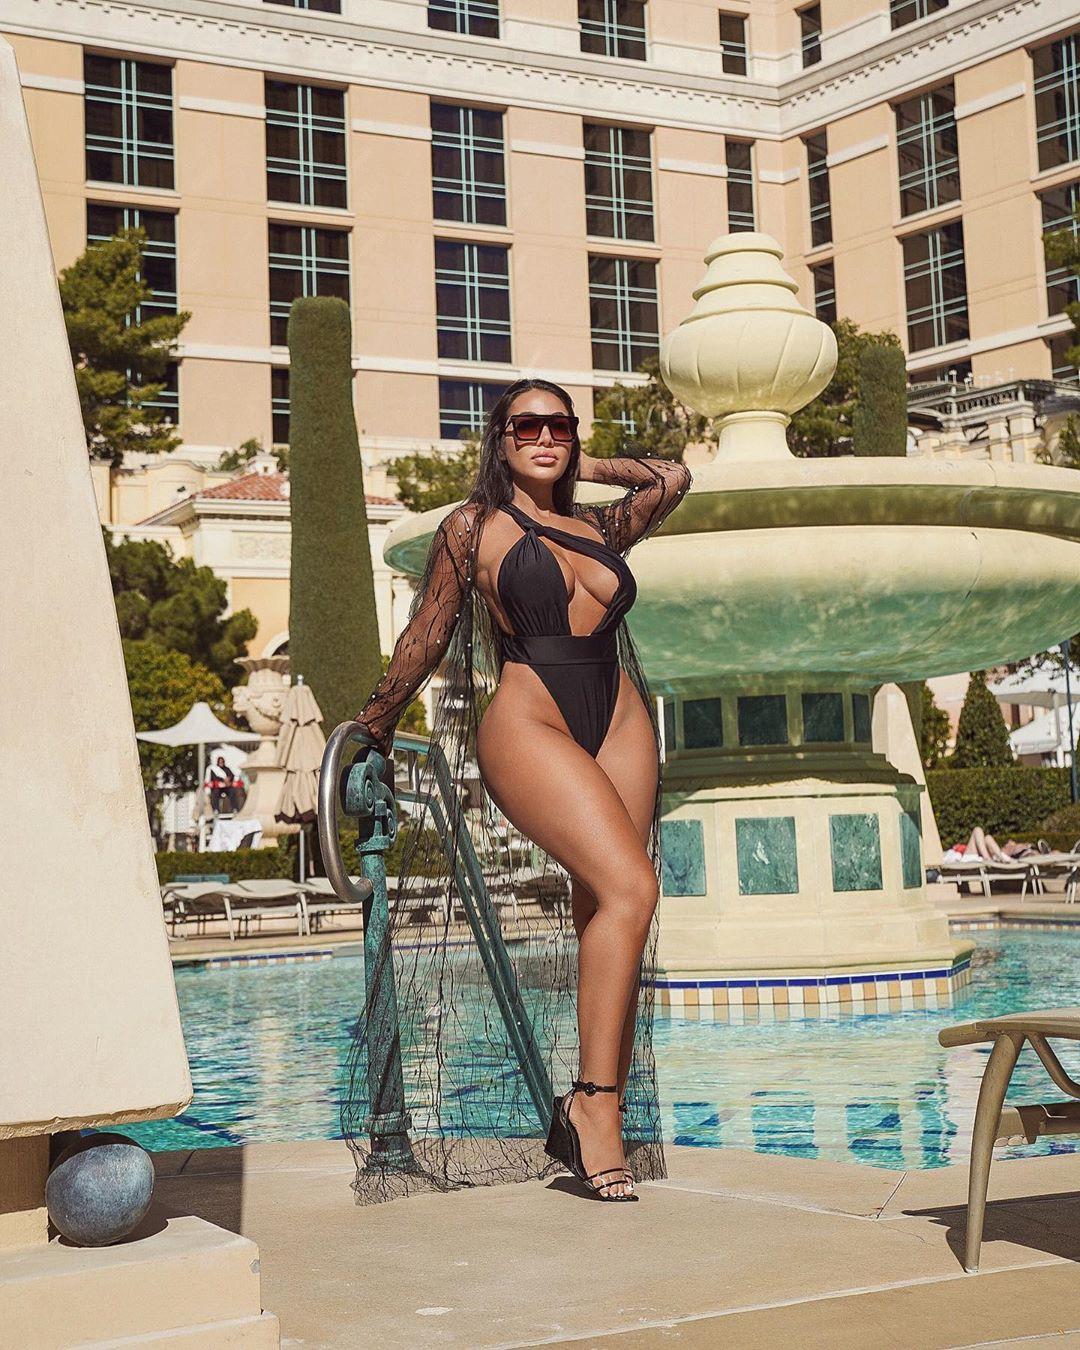 Aylen Alvarez swimwear dress for women, photoshoot poses, legs pic